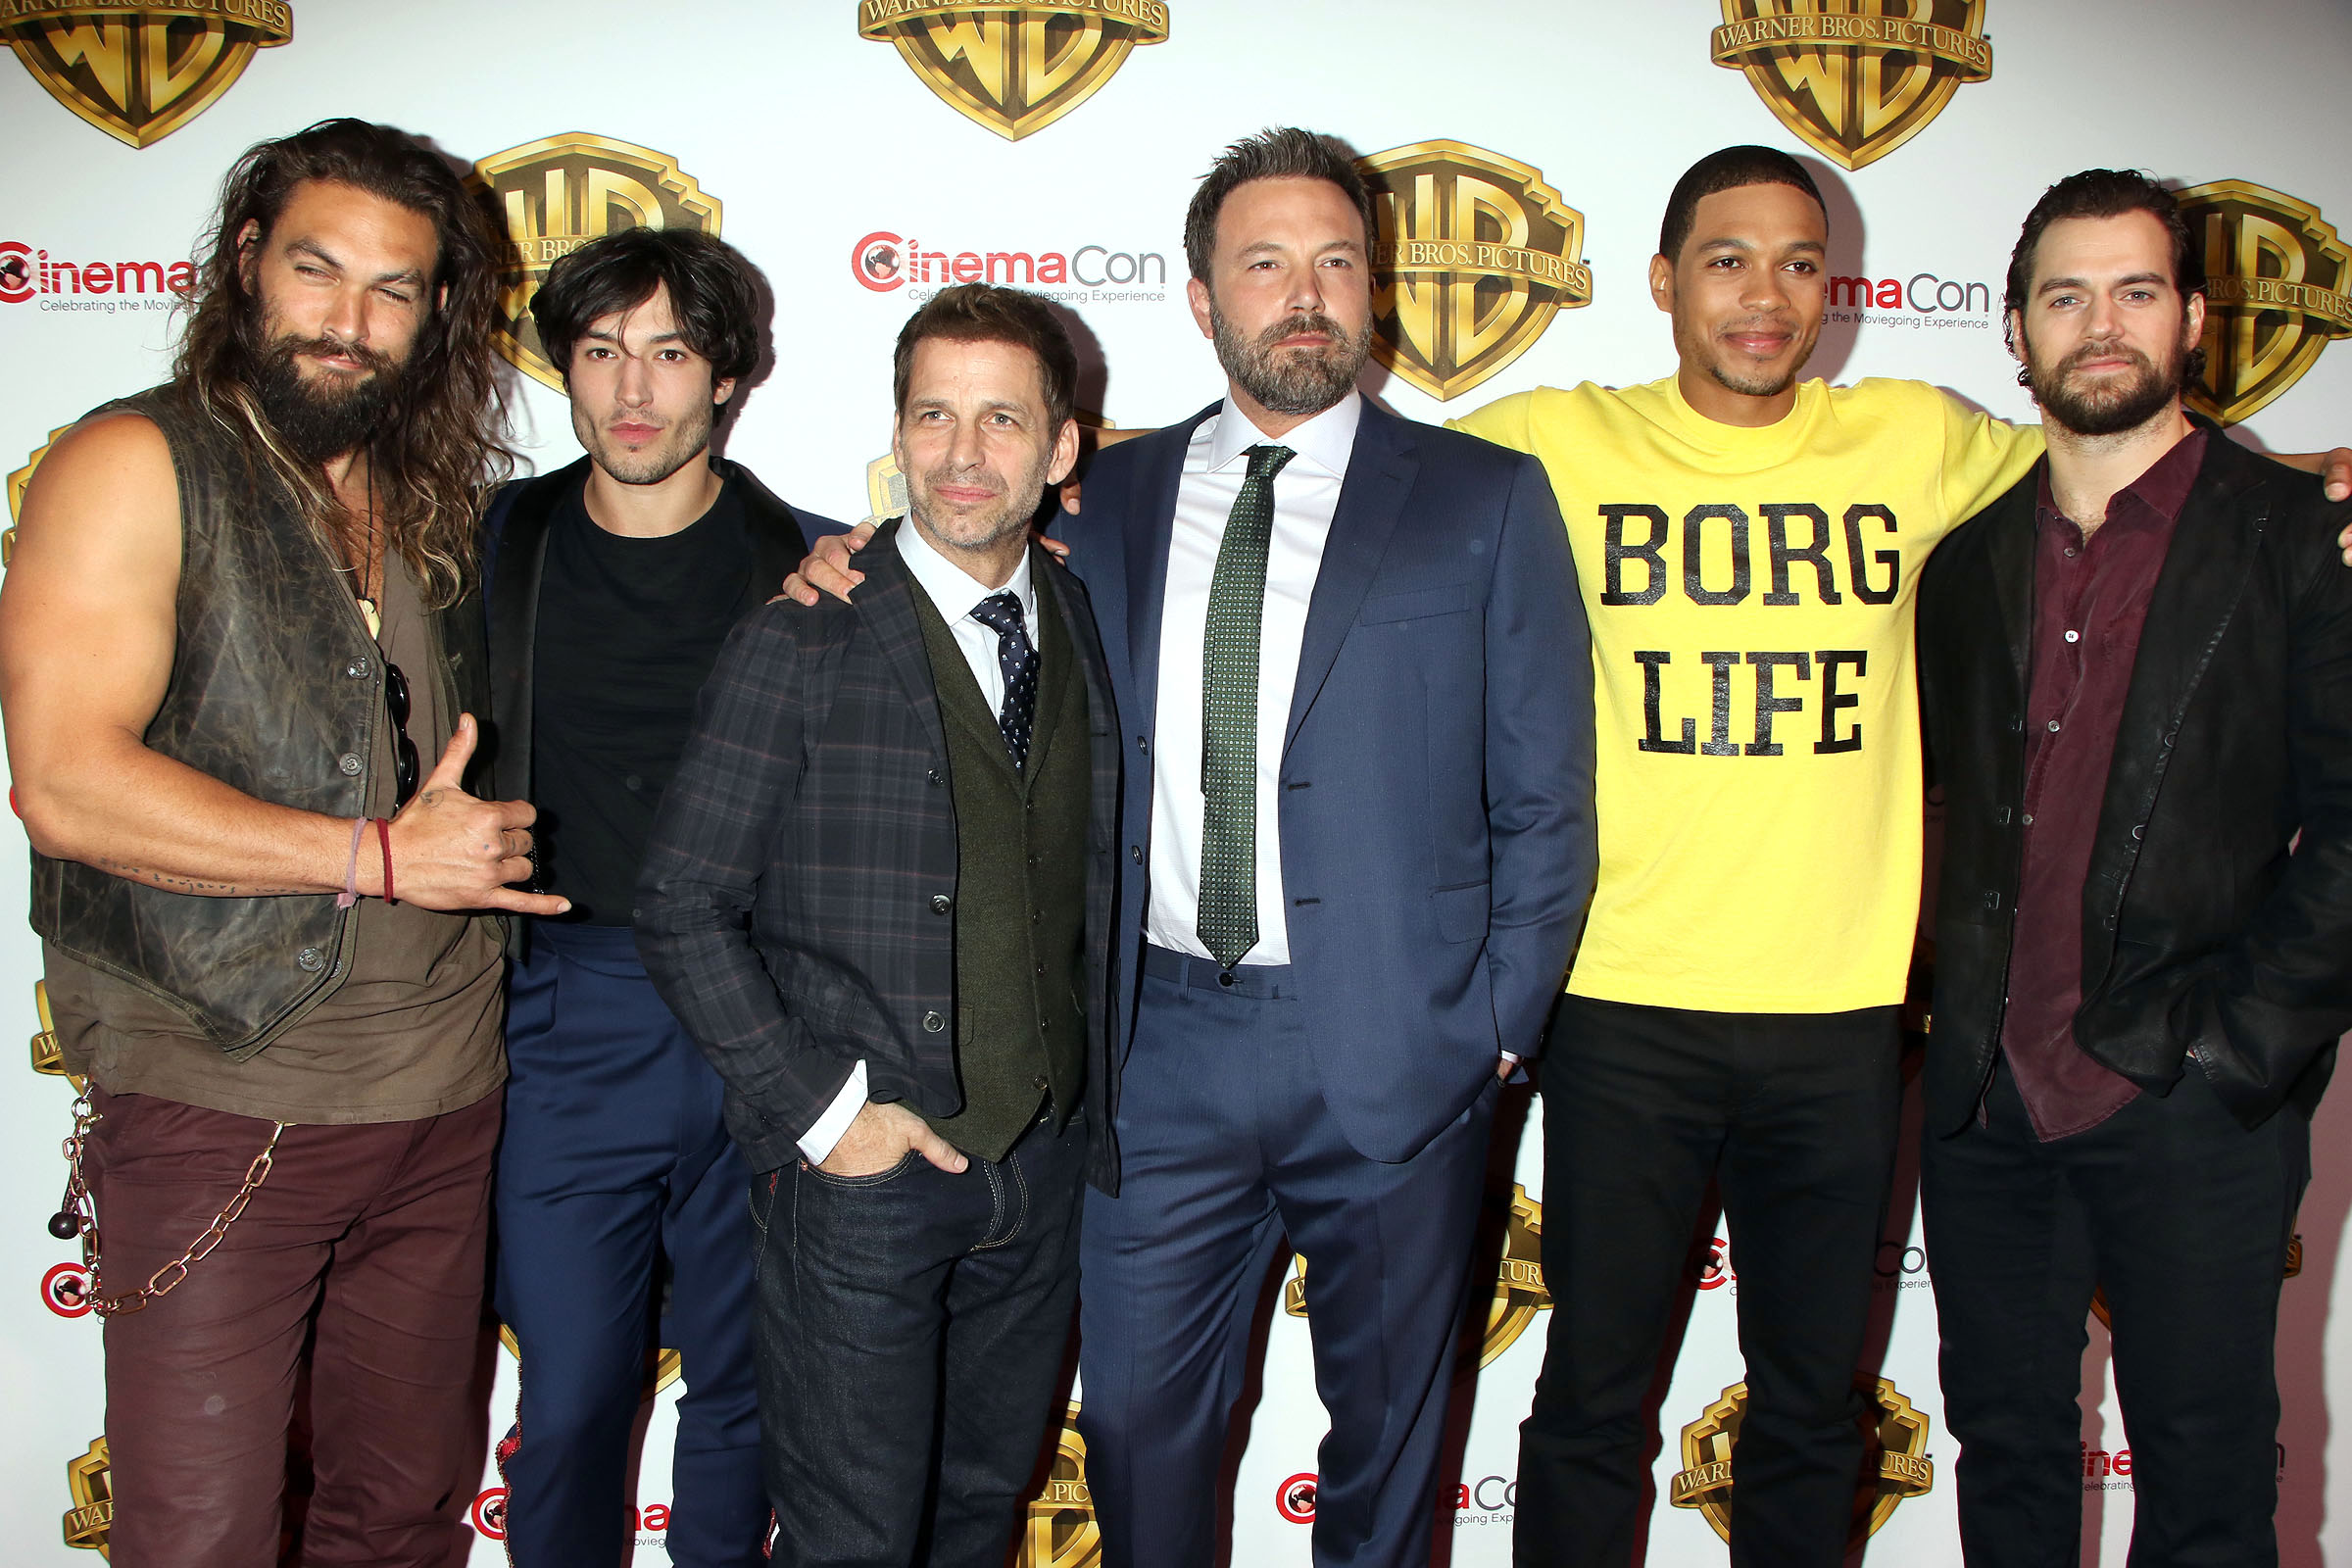 Зак Снайдер с актерами из Лиги Справедливости